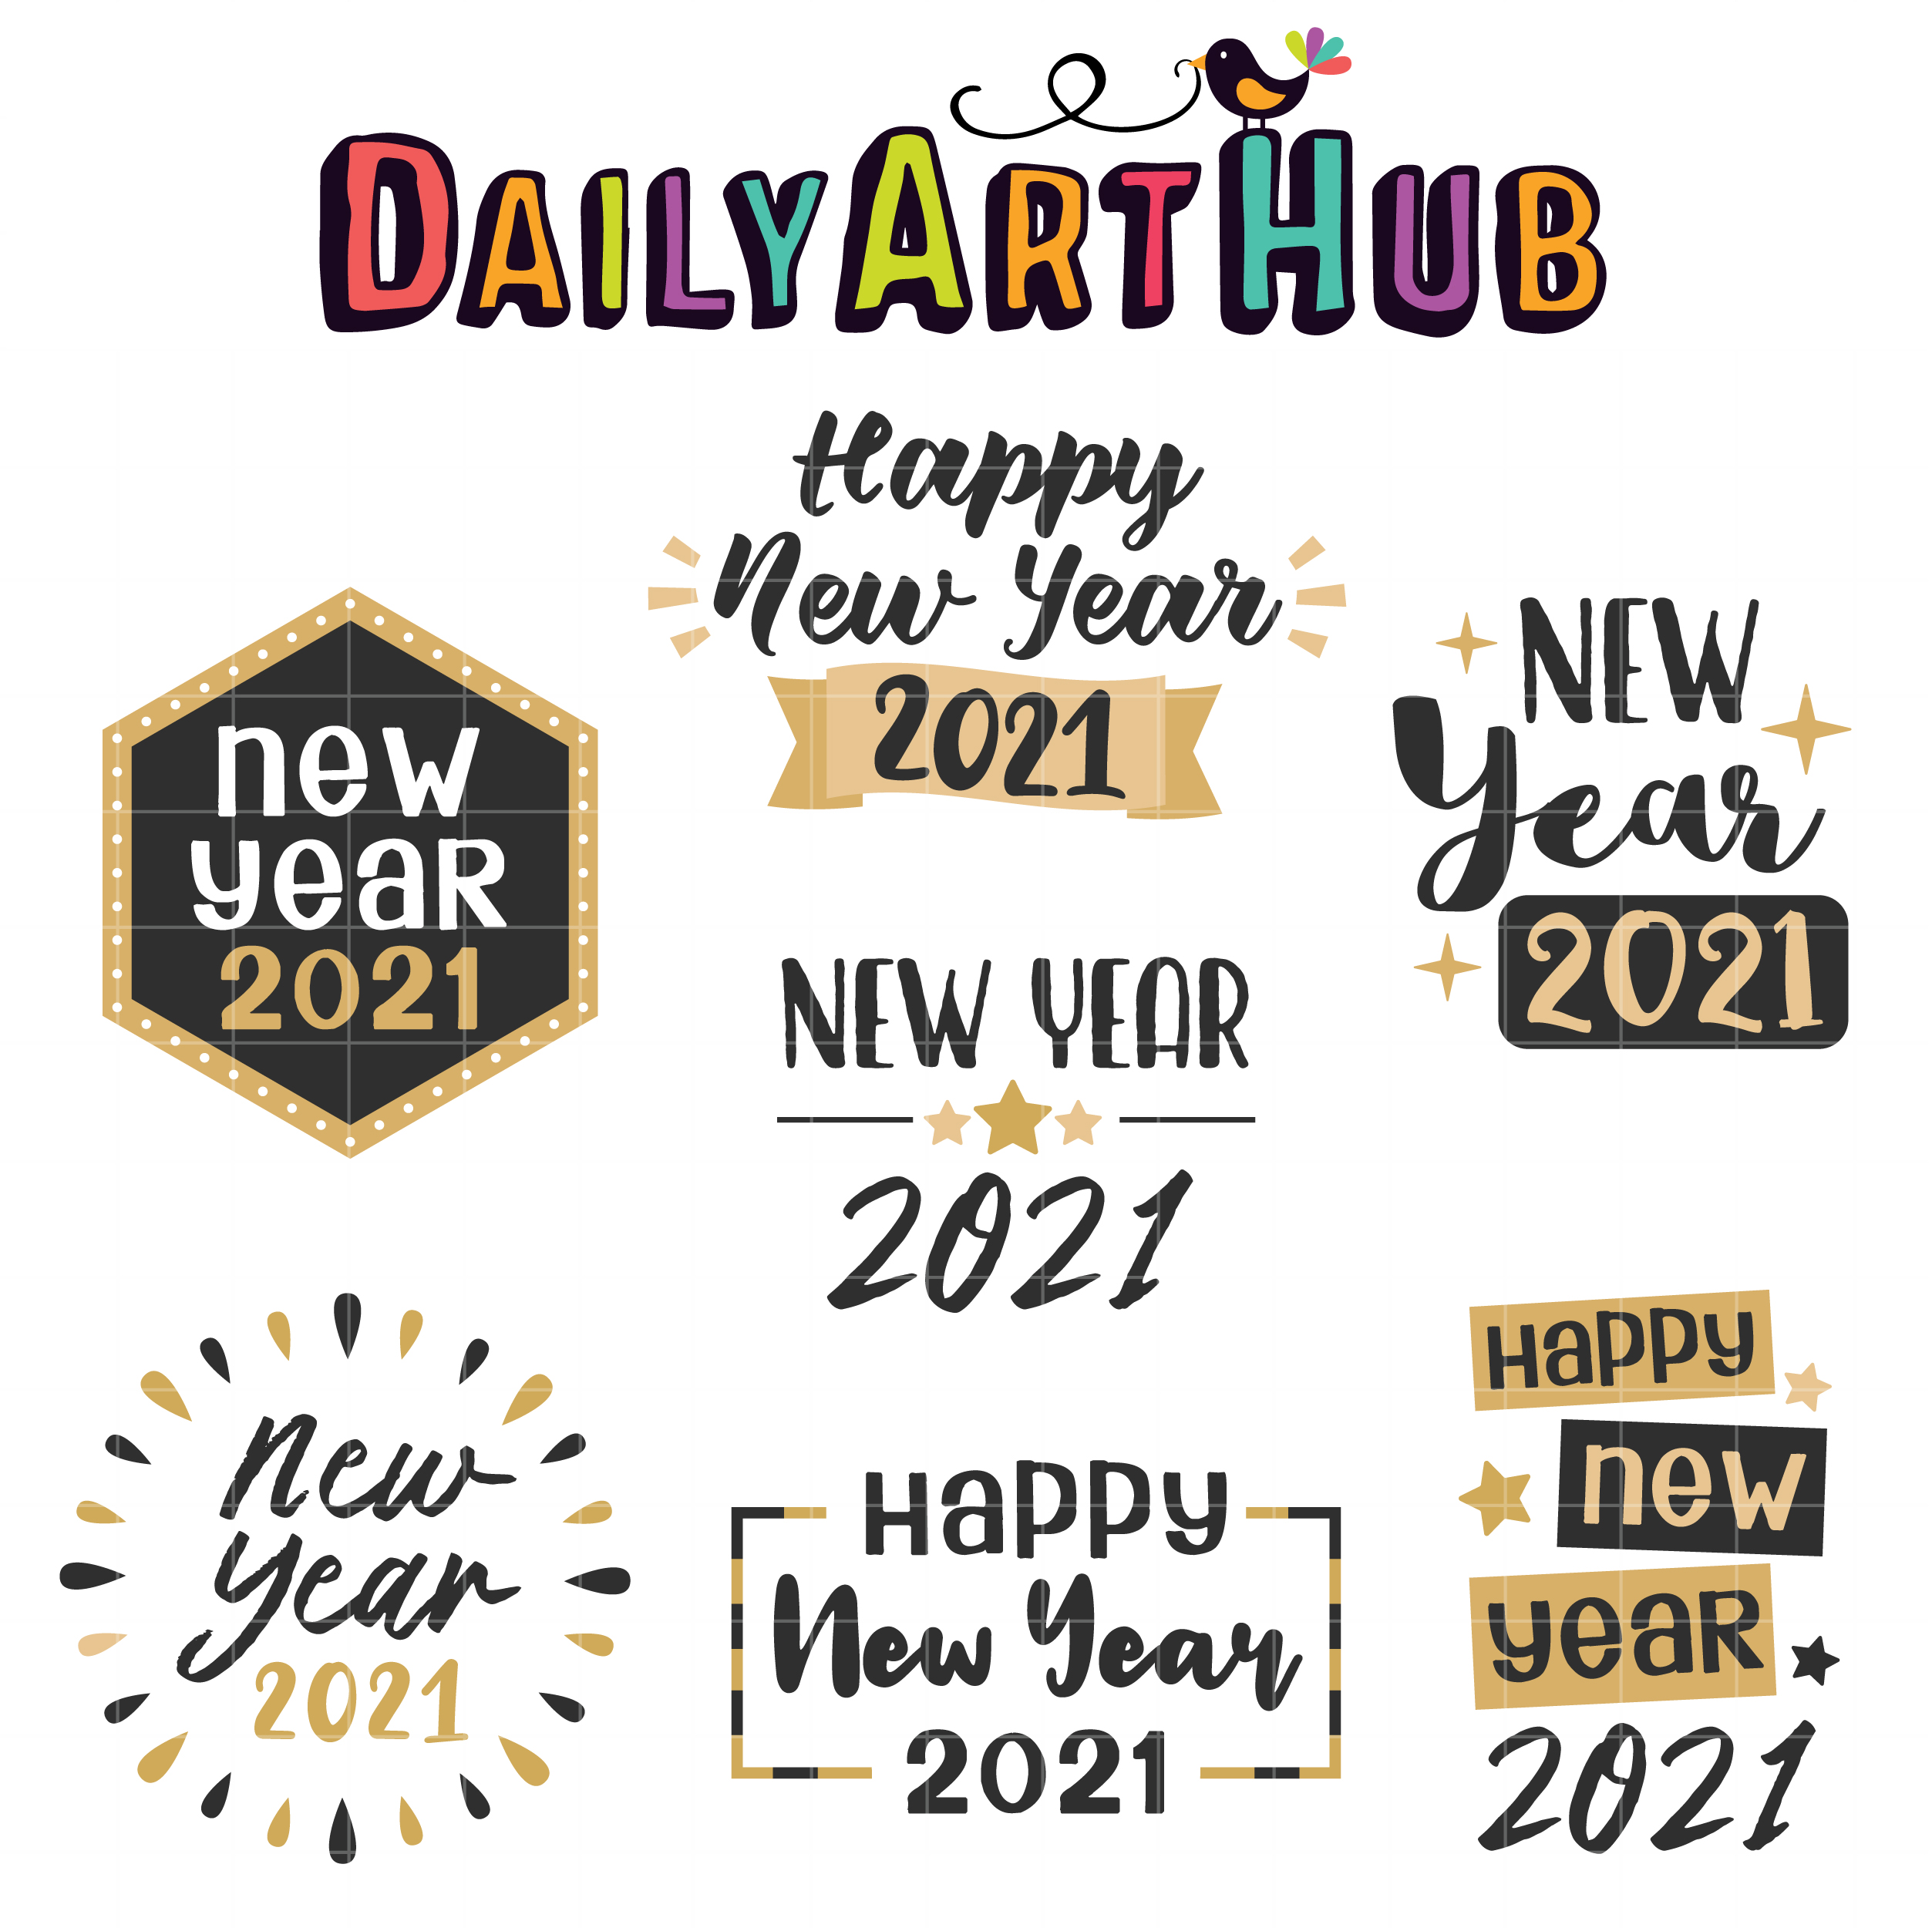 new year 2021 clip art set daily art hub free clip art everyday new year 2021 clip art set